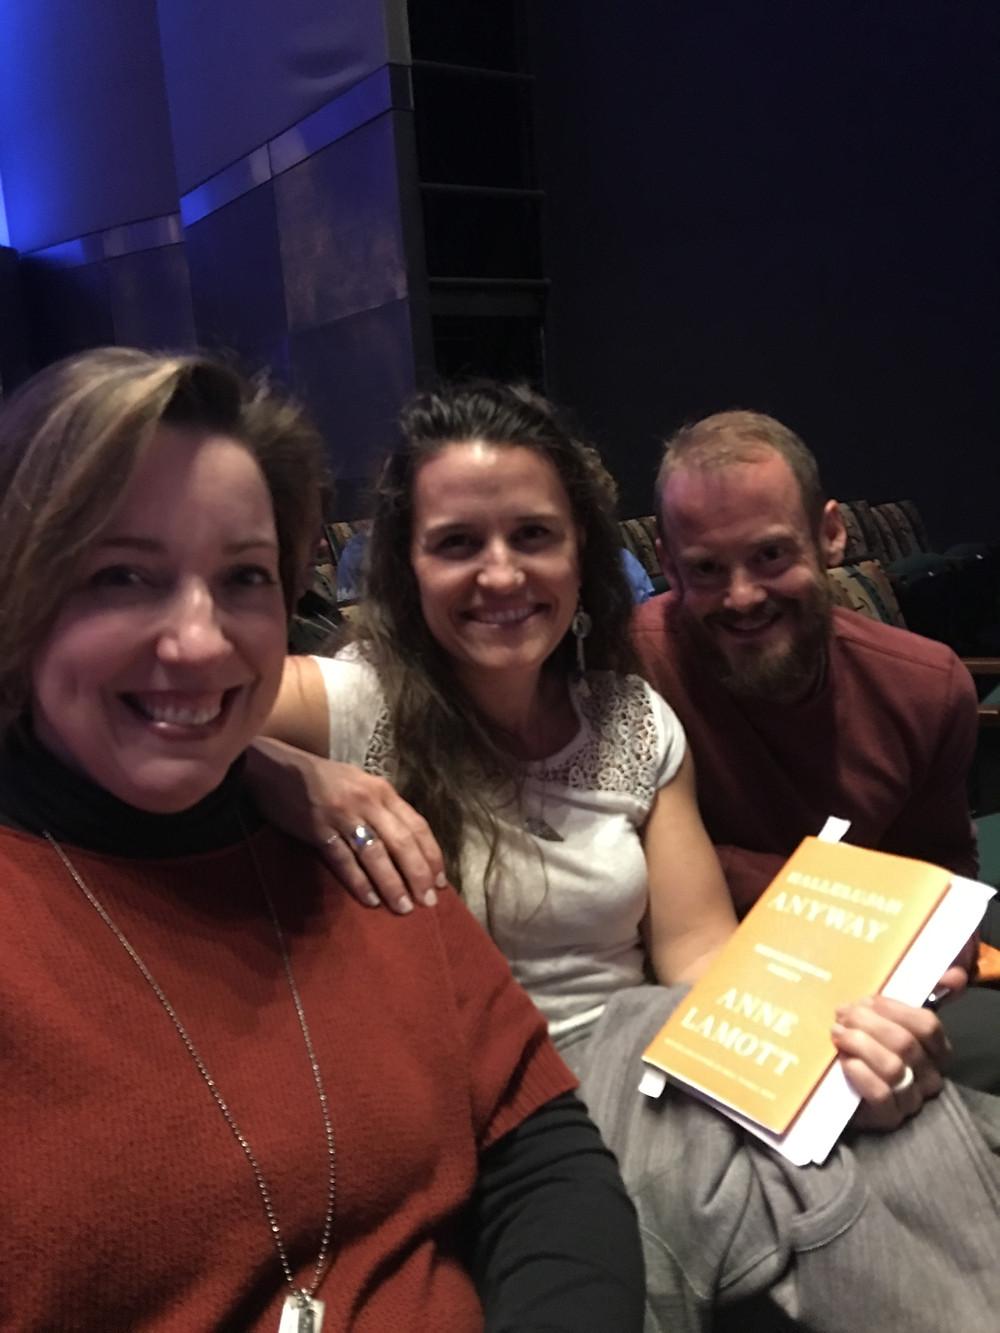 Elizabeth and Nate took me to hear Anne Lamott speak.